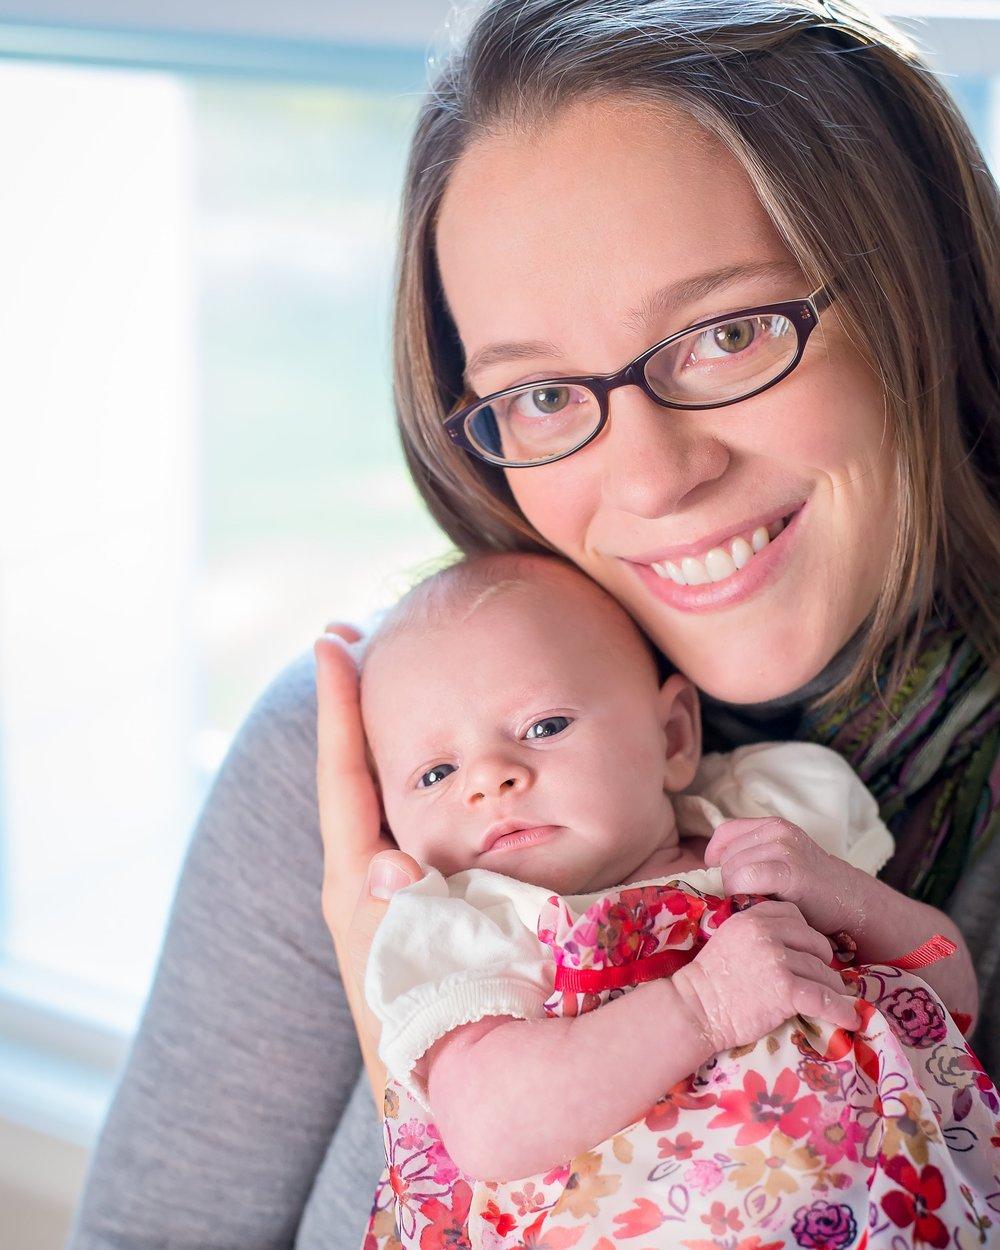 Julie_Trotter_postpartum.jpg